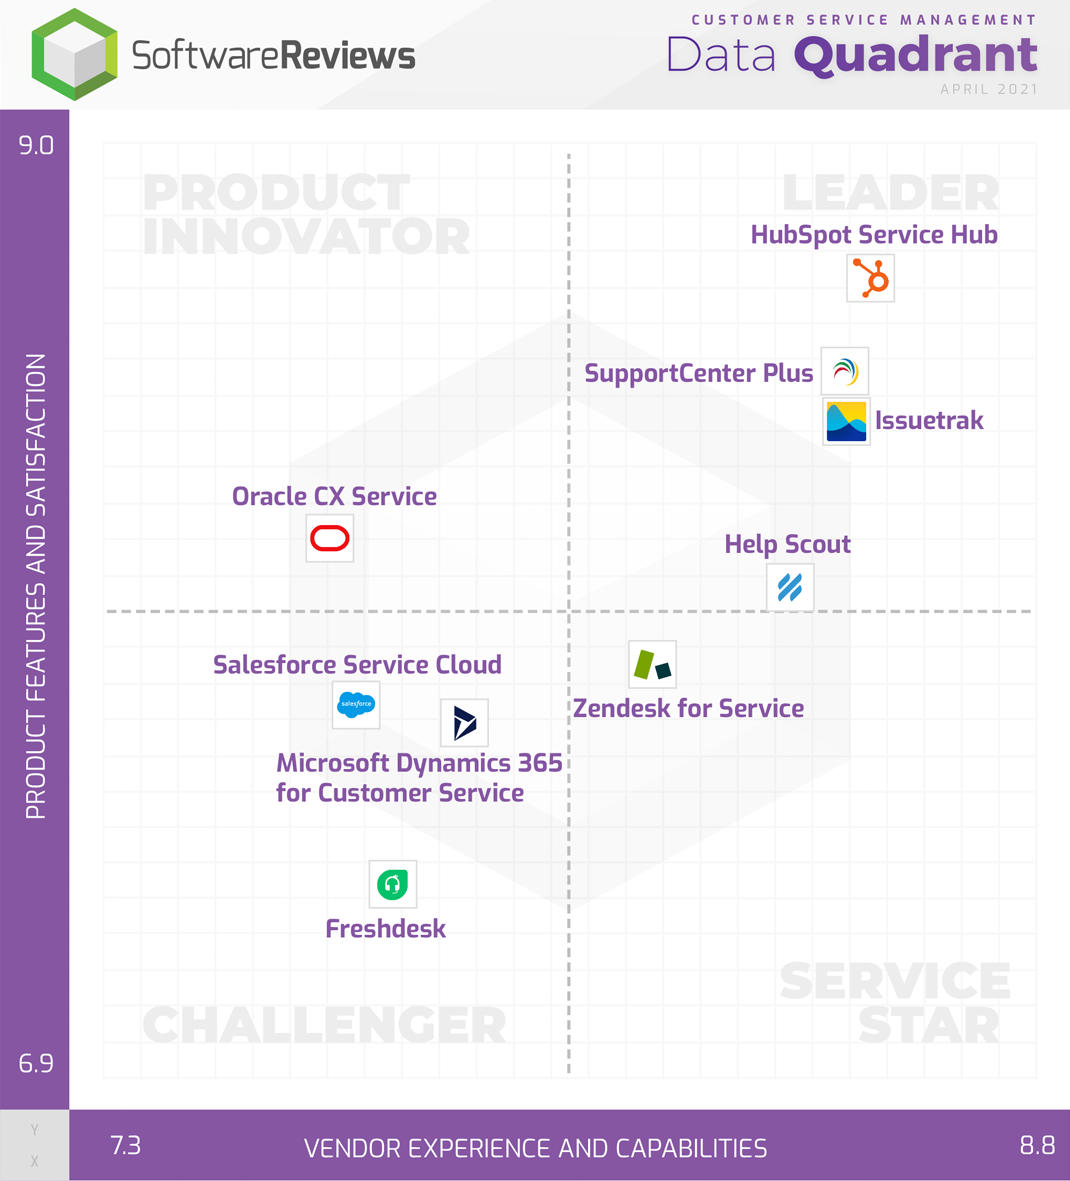 SoftwareReviews Data Quadrant